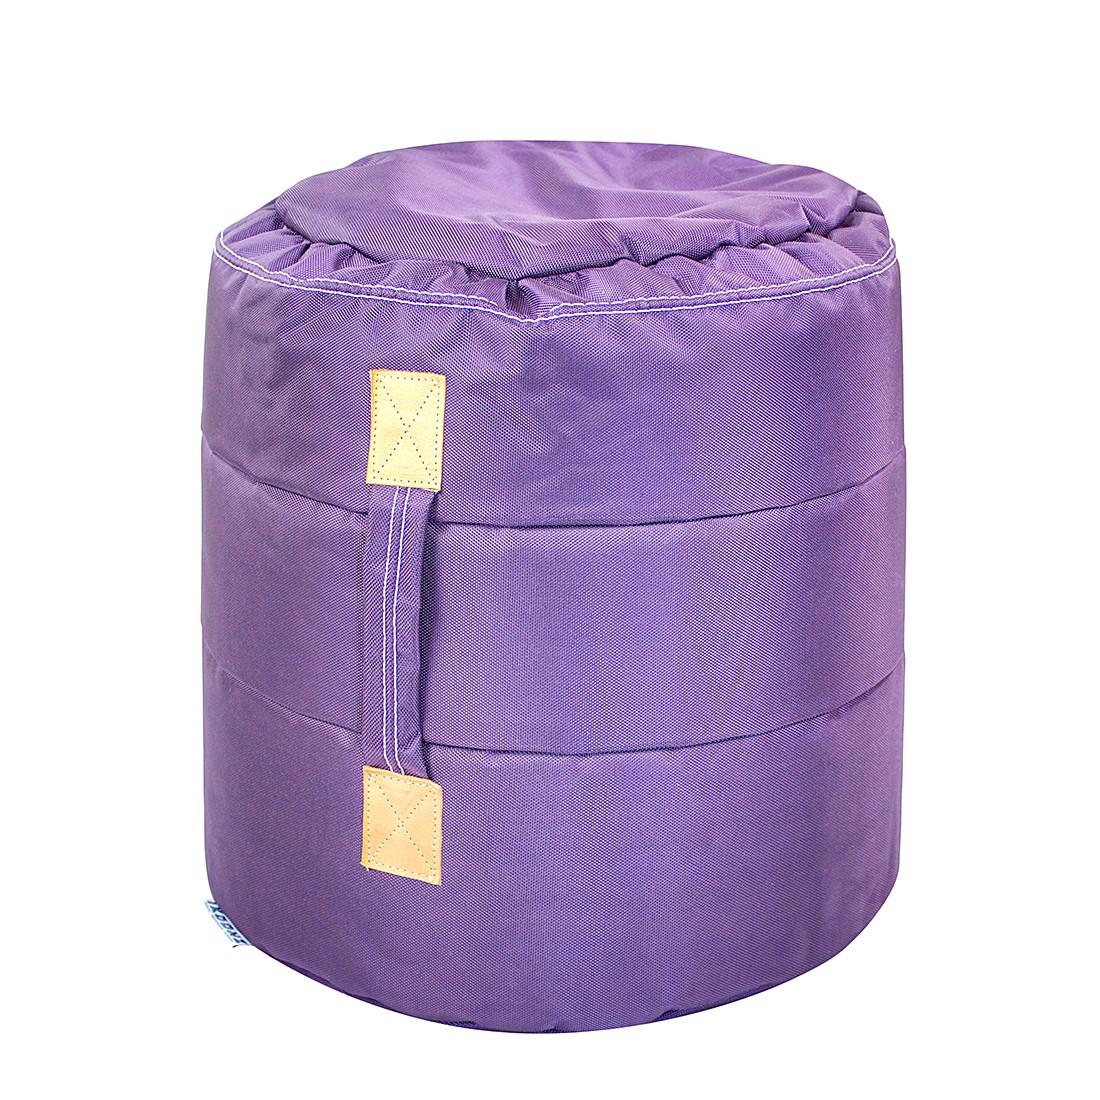 Hocker Tub – Purple, Ikoonz jetzt kaufen